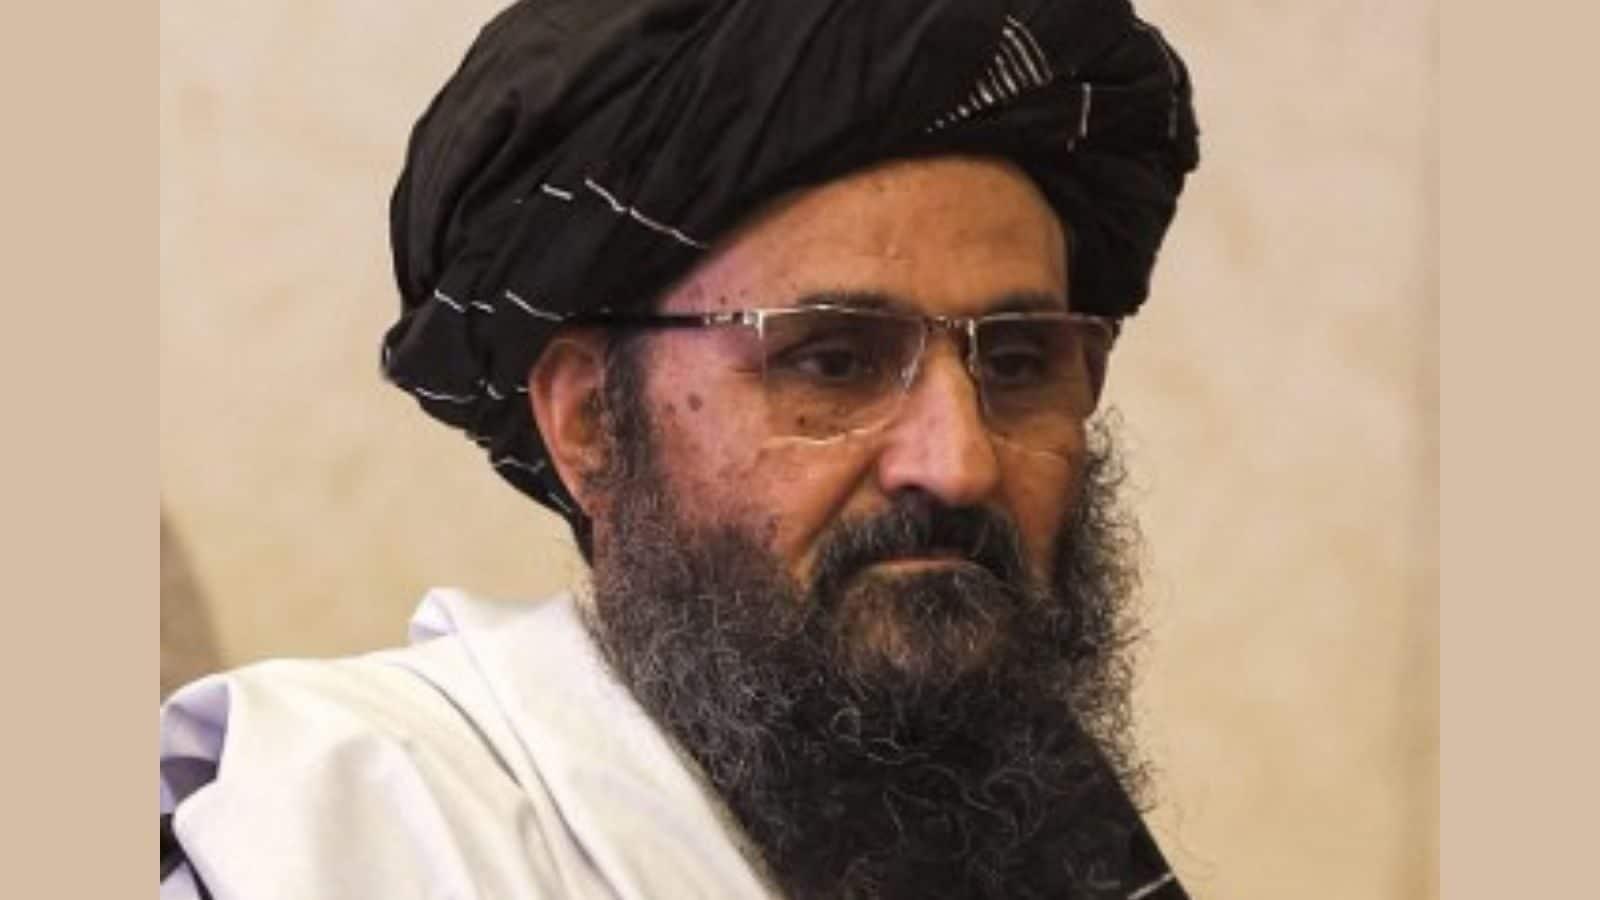 Taliban Govt's Deputy PM Mullah Baradar Trashes News of His Death, Says 'Fake Propaganda'